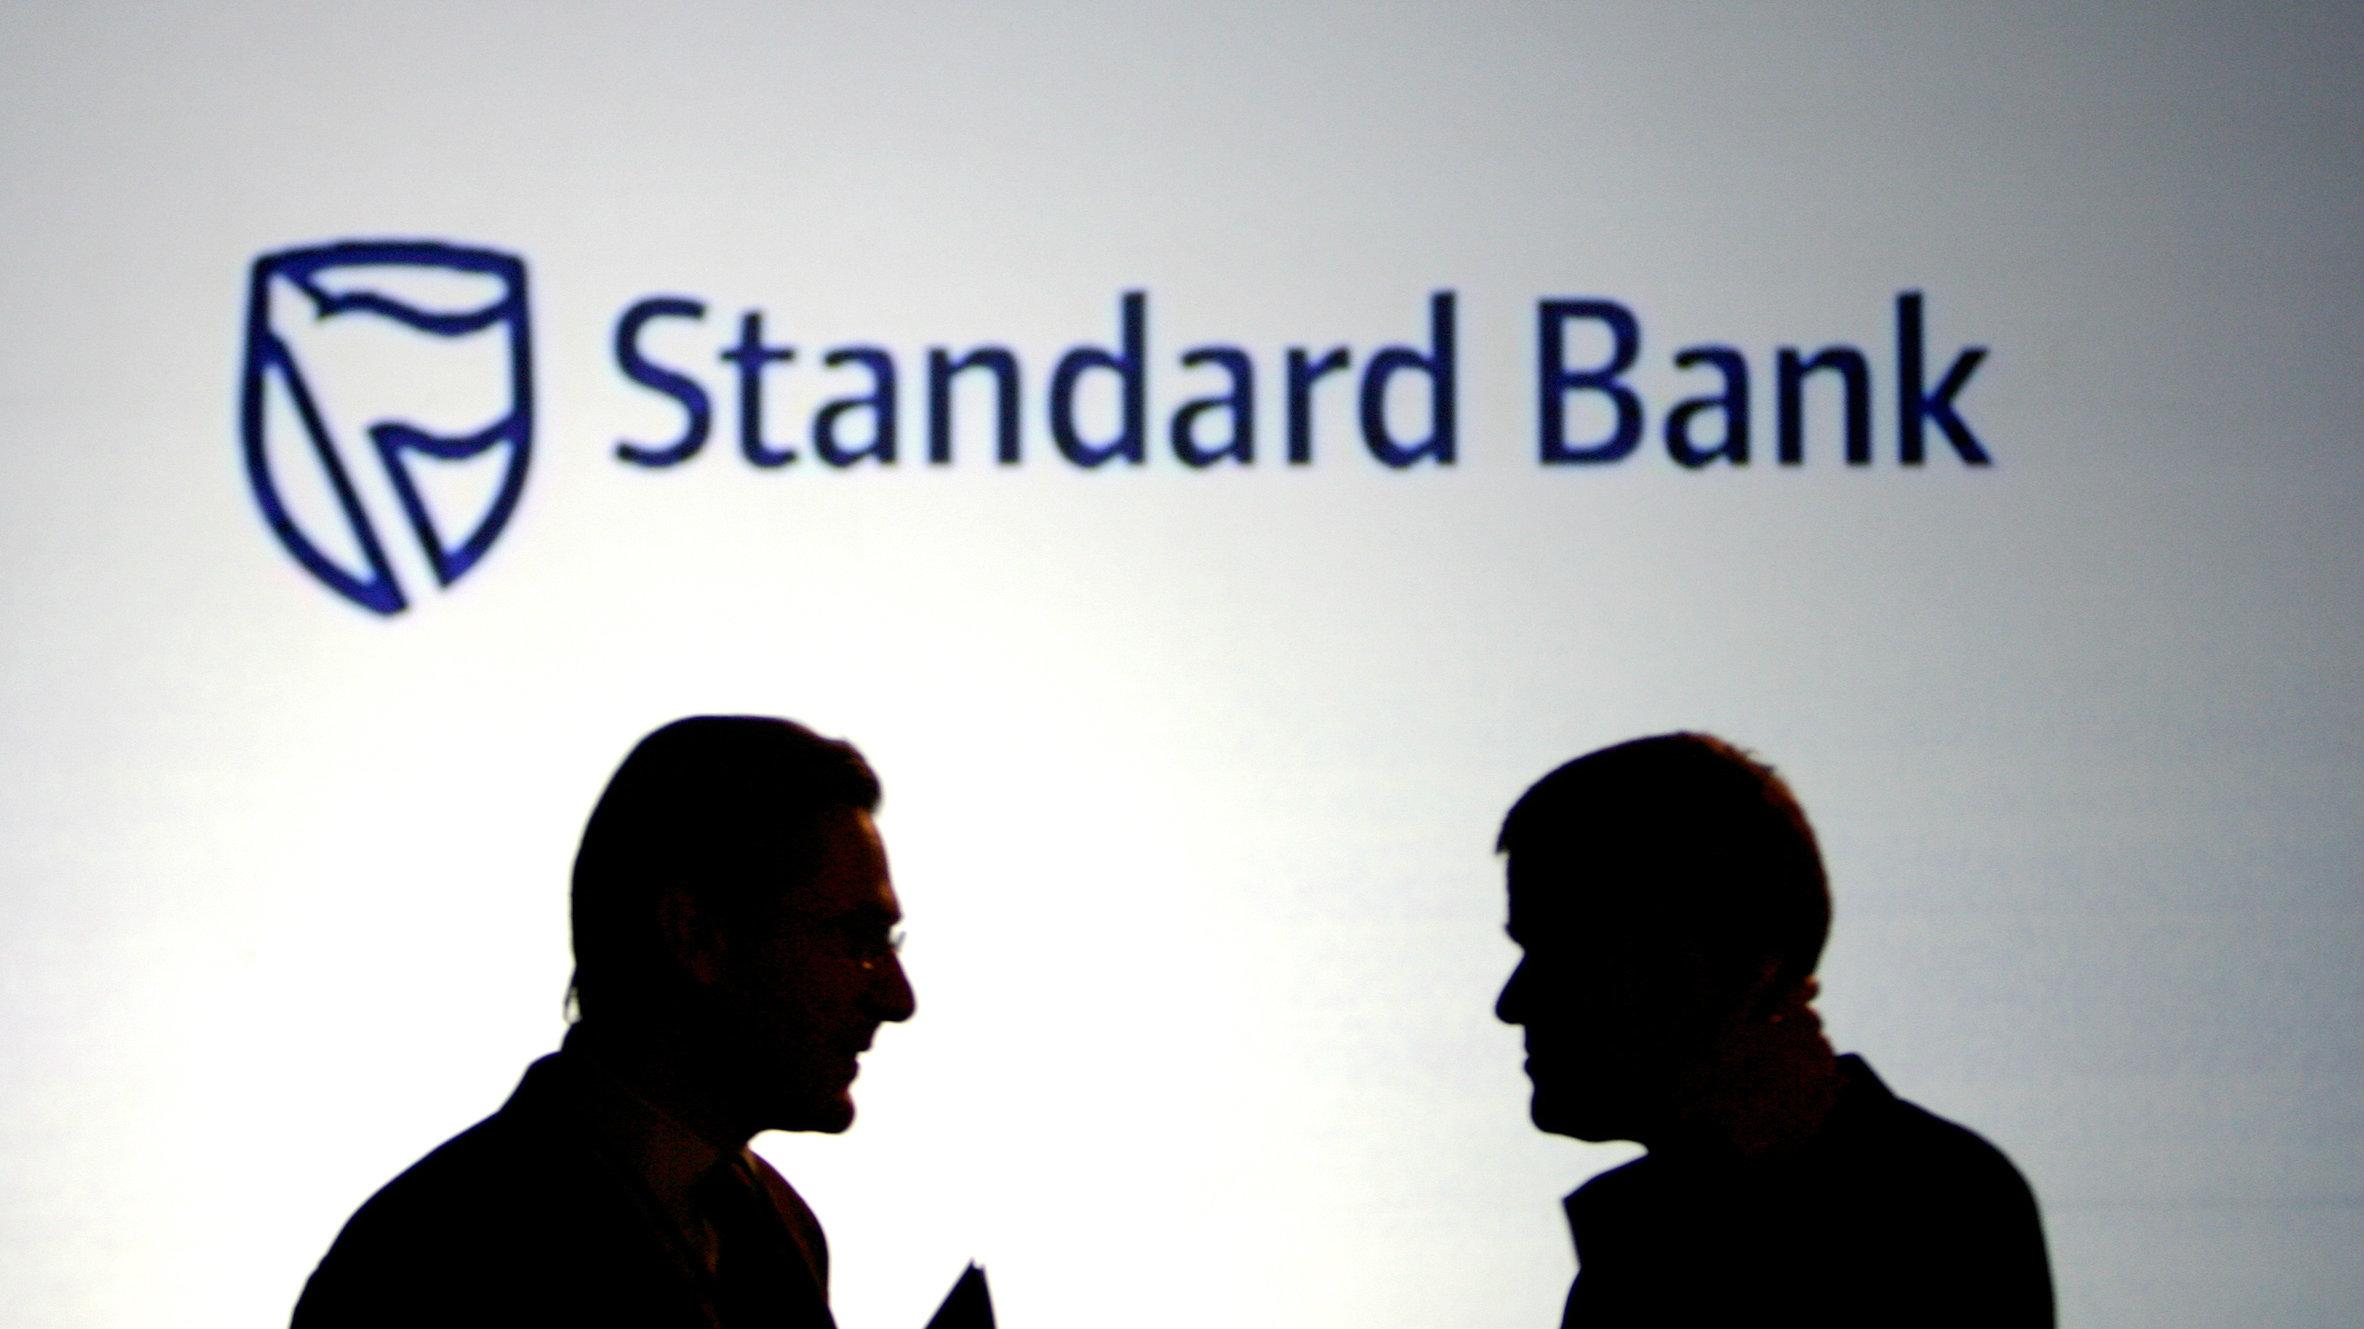 Businessmen chat in front of a Standard Bank logo in Sandton outside Johannesburg October 25, 2007.